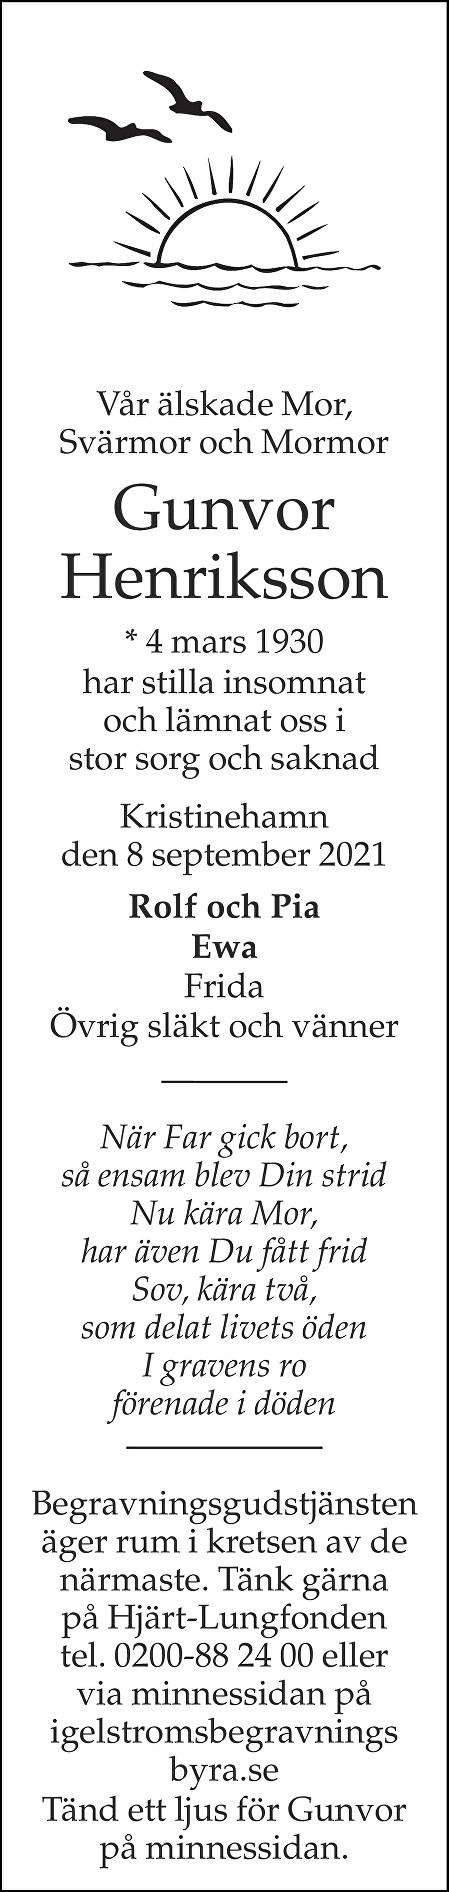 Gunvor Henriksson Death notice